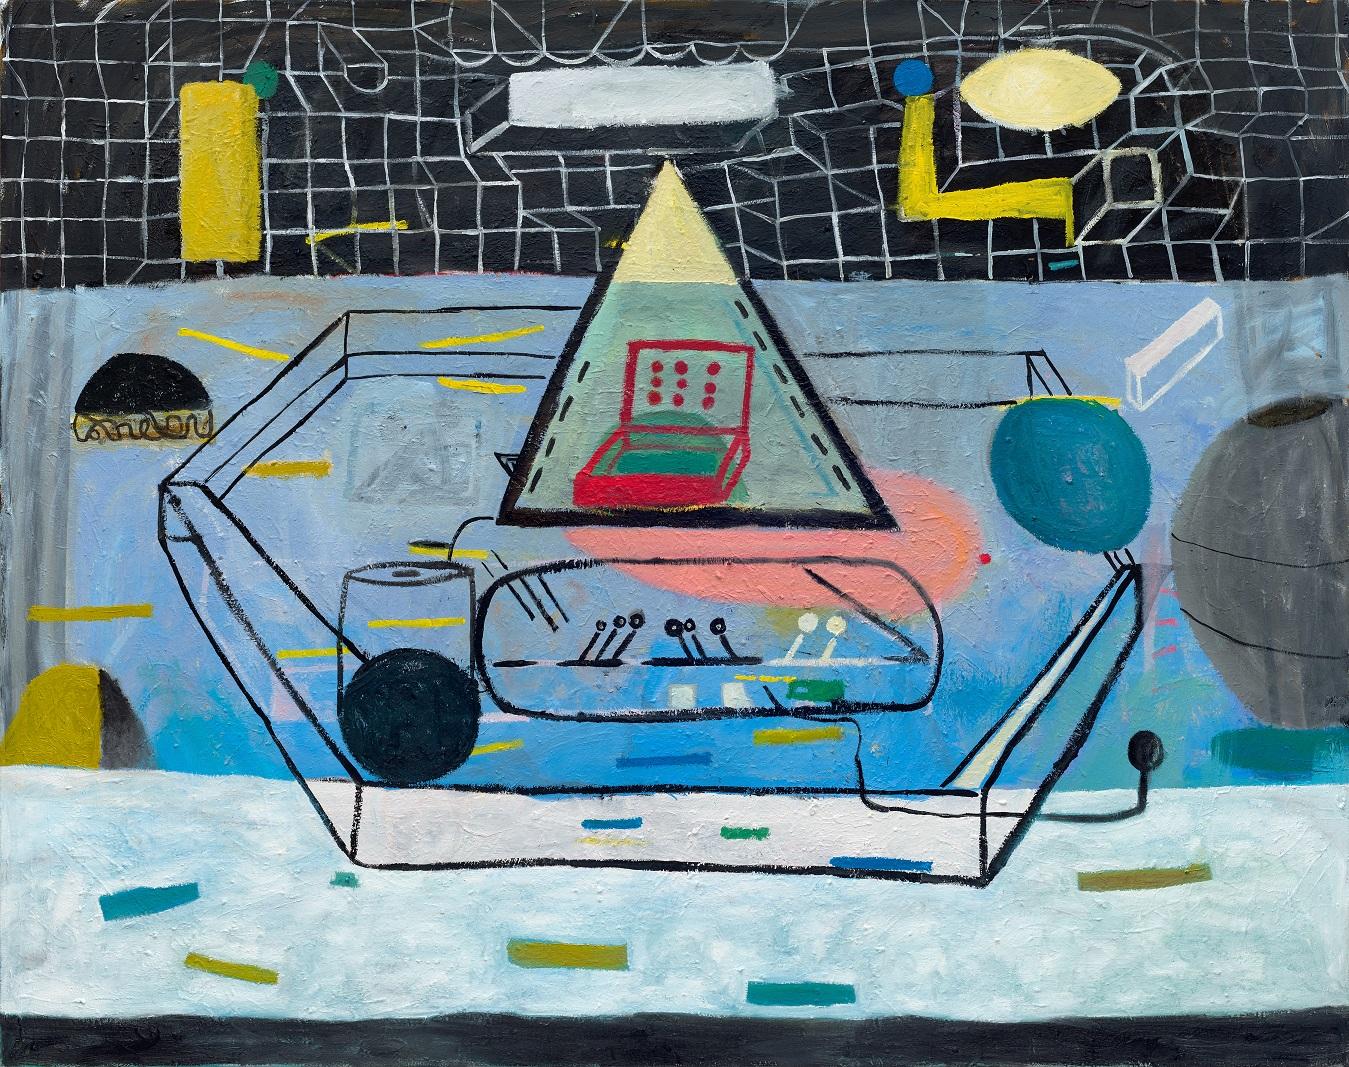 Tobias Hild: No, No, 2015, Öl auf Leinwand, 190 x 240 cm. Foto: Tobias Hild